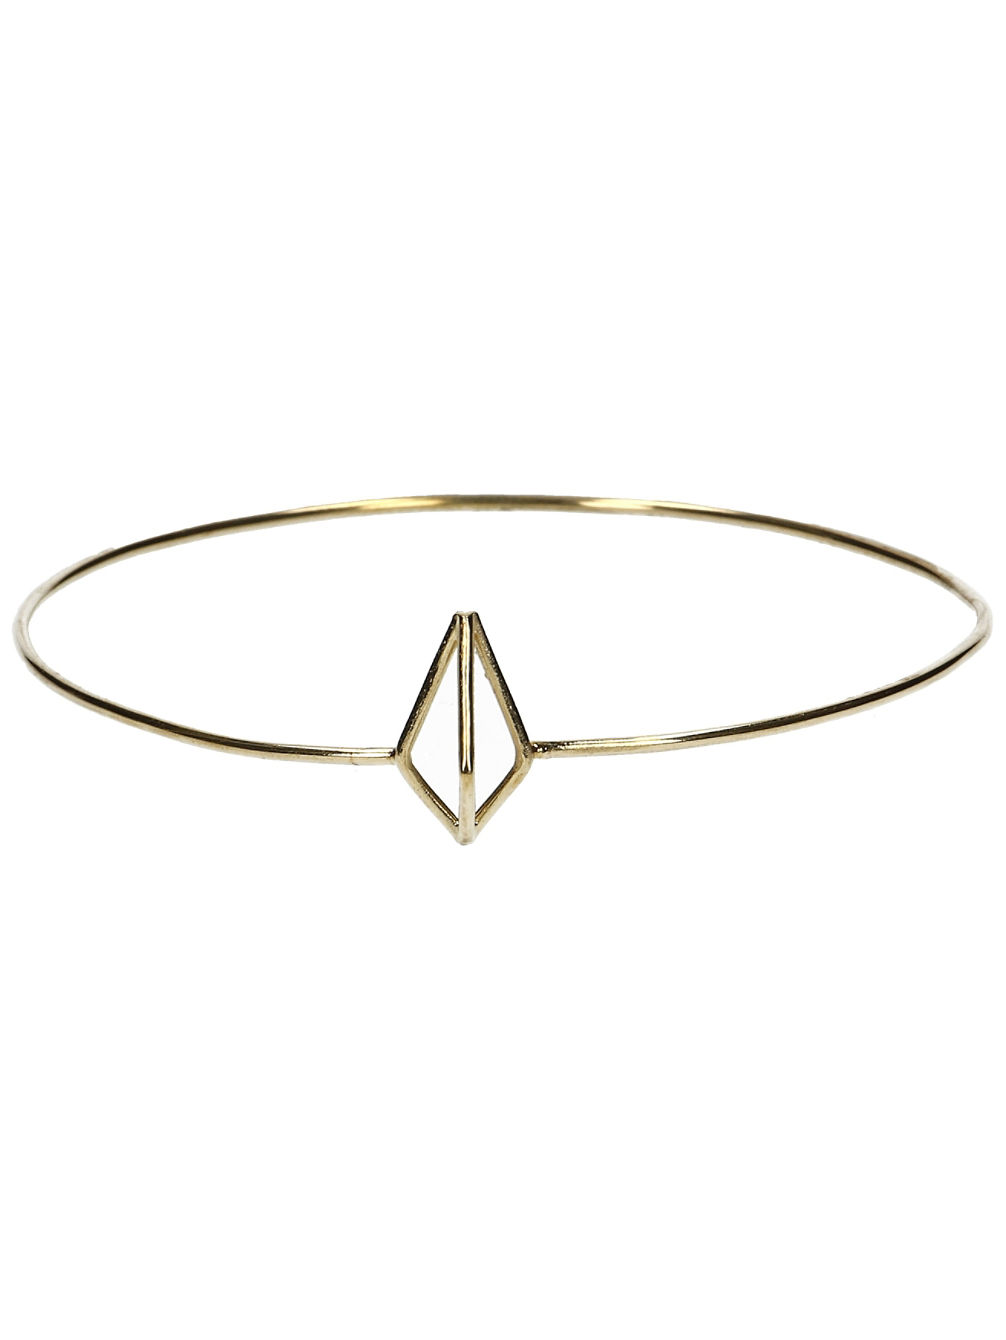 epic-hald-diamond-bangle